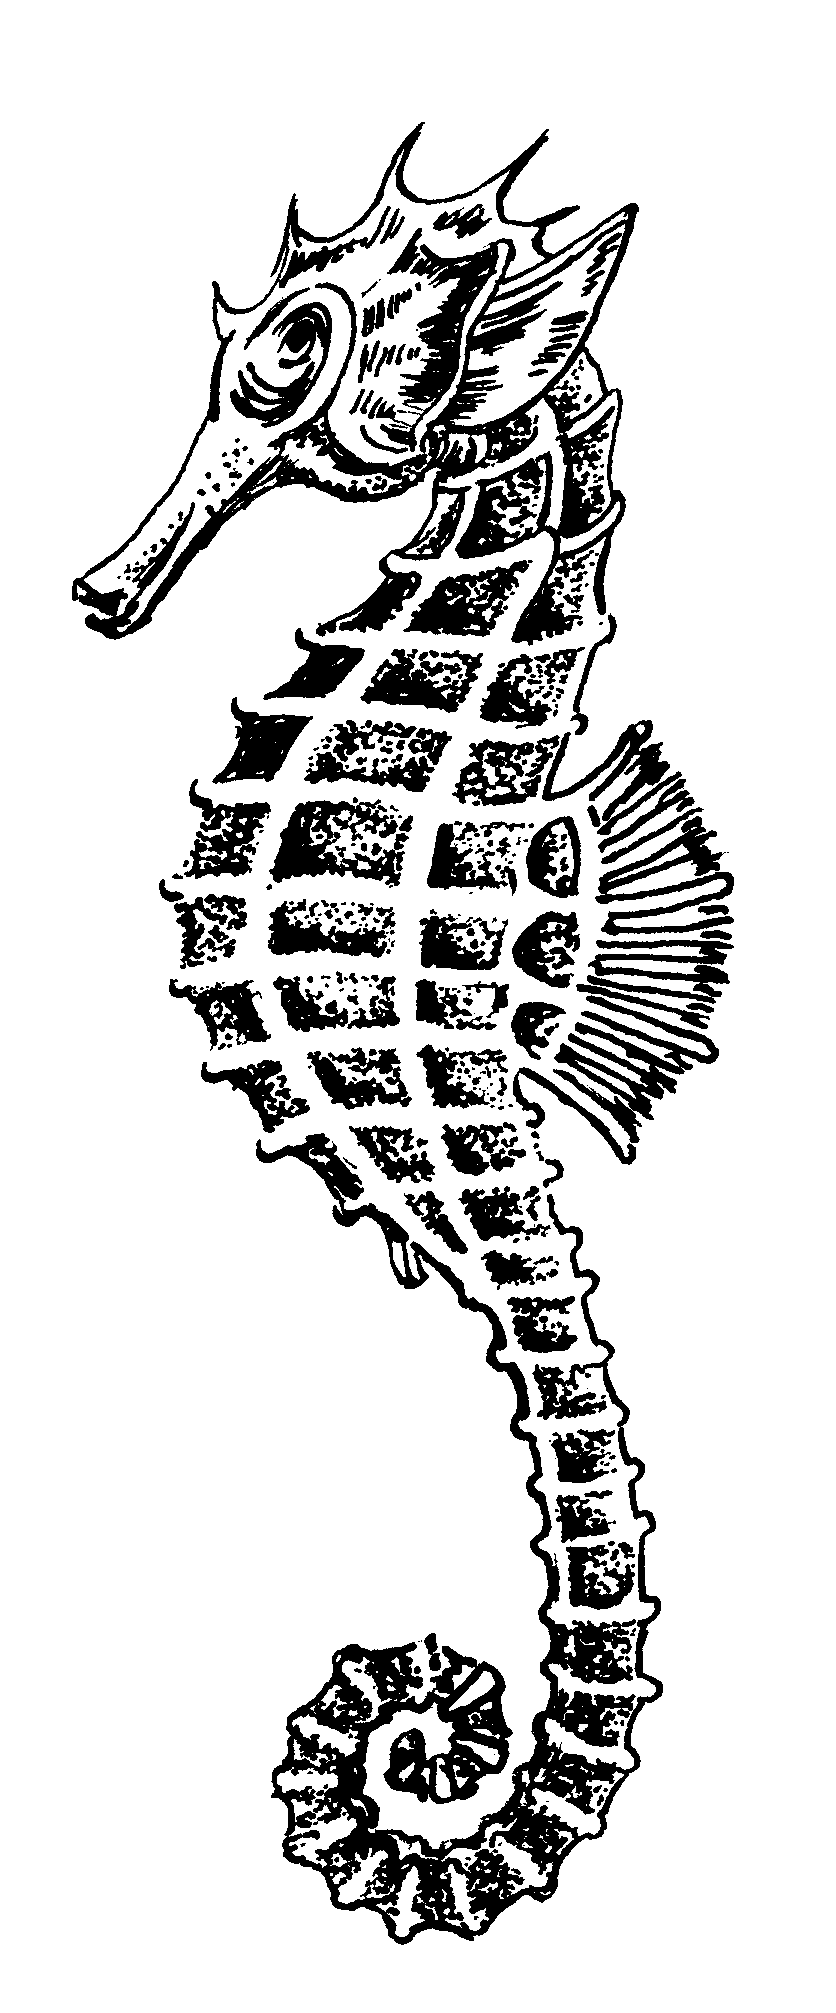 Seahorse public domain image. Shell clipart sea horse